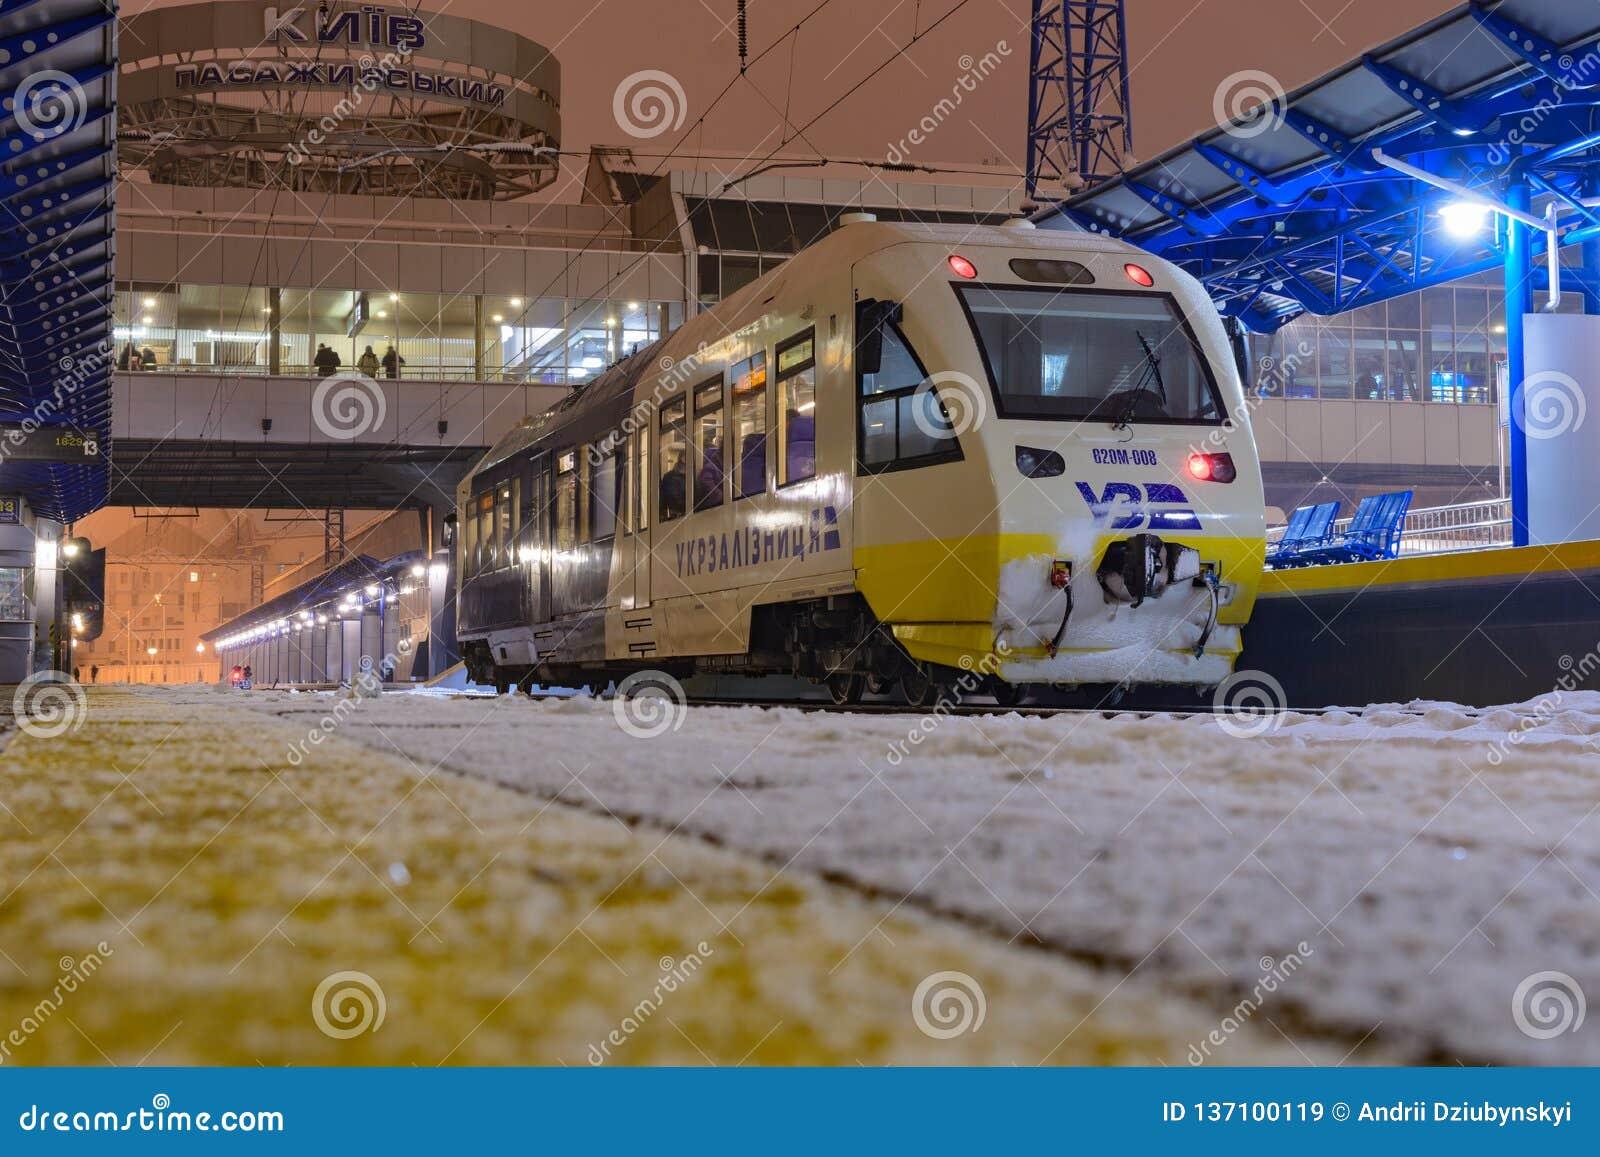 Kyiv, de Oekraïne - December 14, 2018: Vernieuwde railbus Pesa voor de nieuwe route van Oekraïense Spoorwegen - kyiv-Boryspil